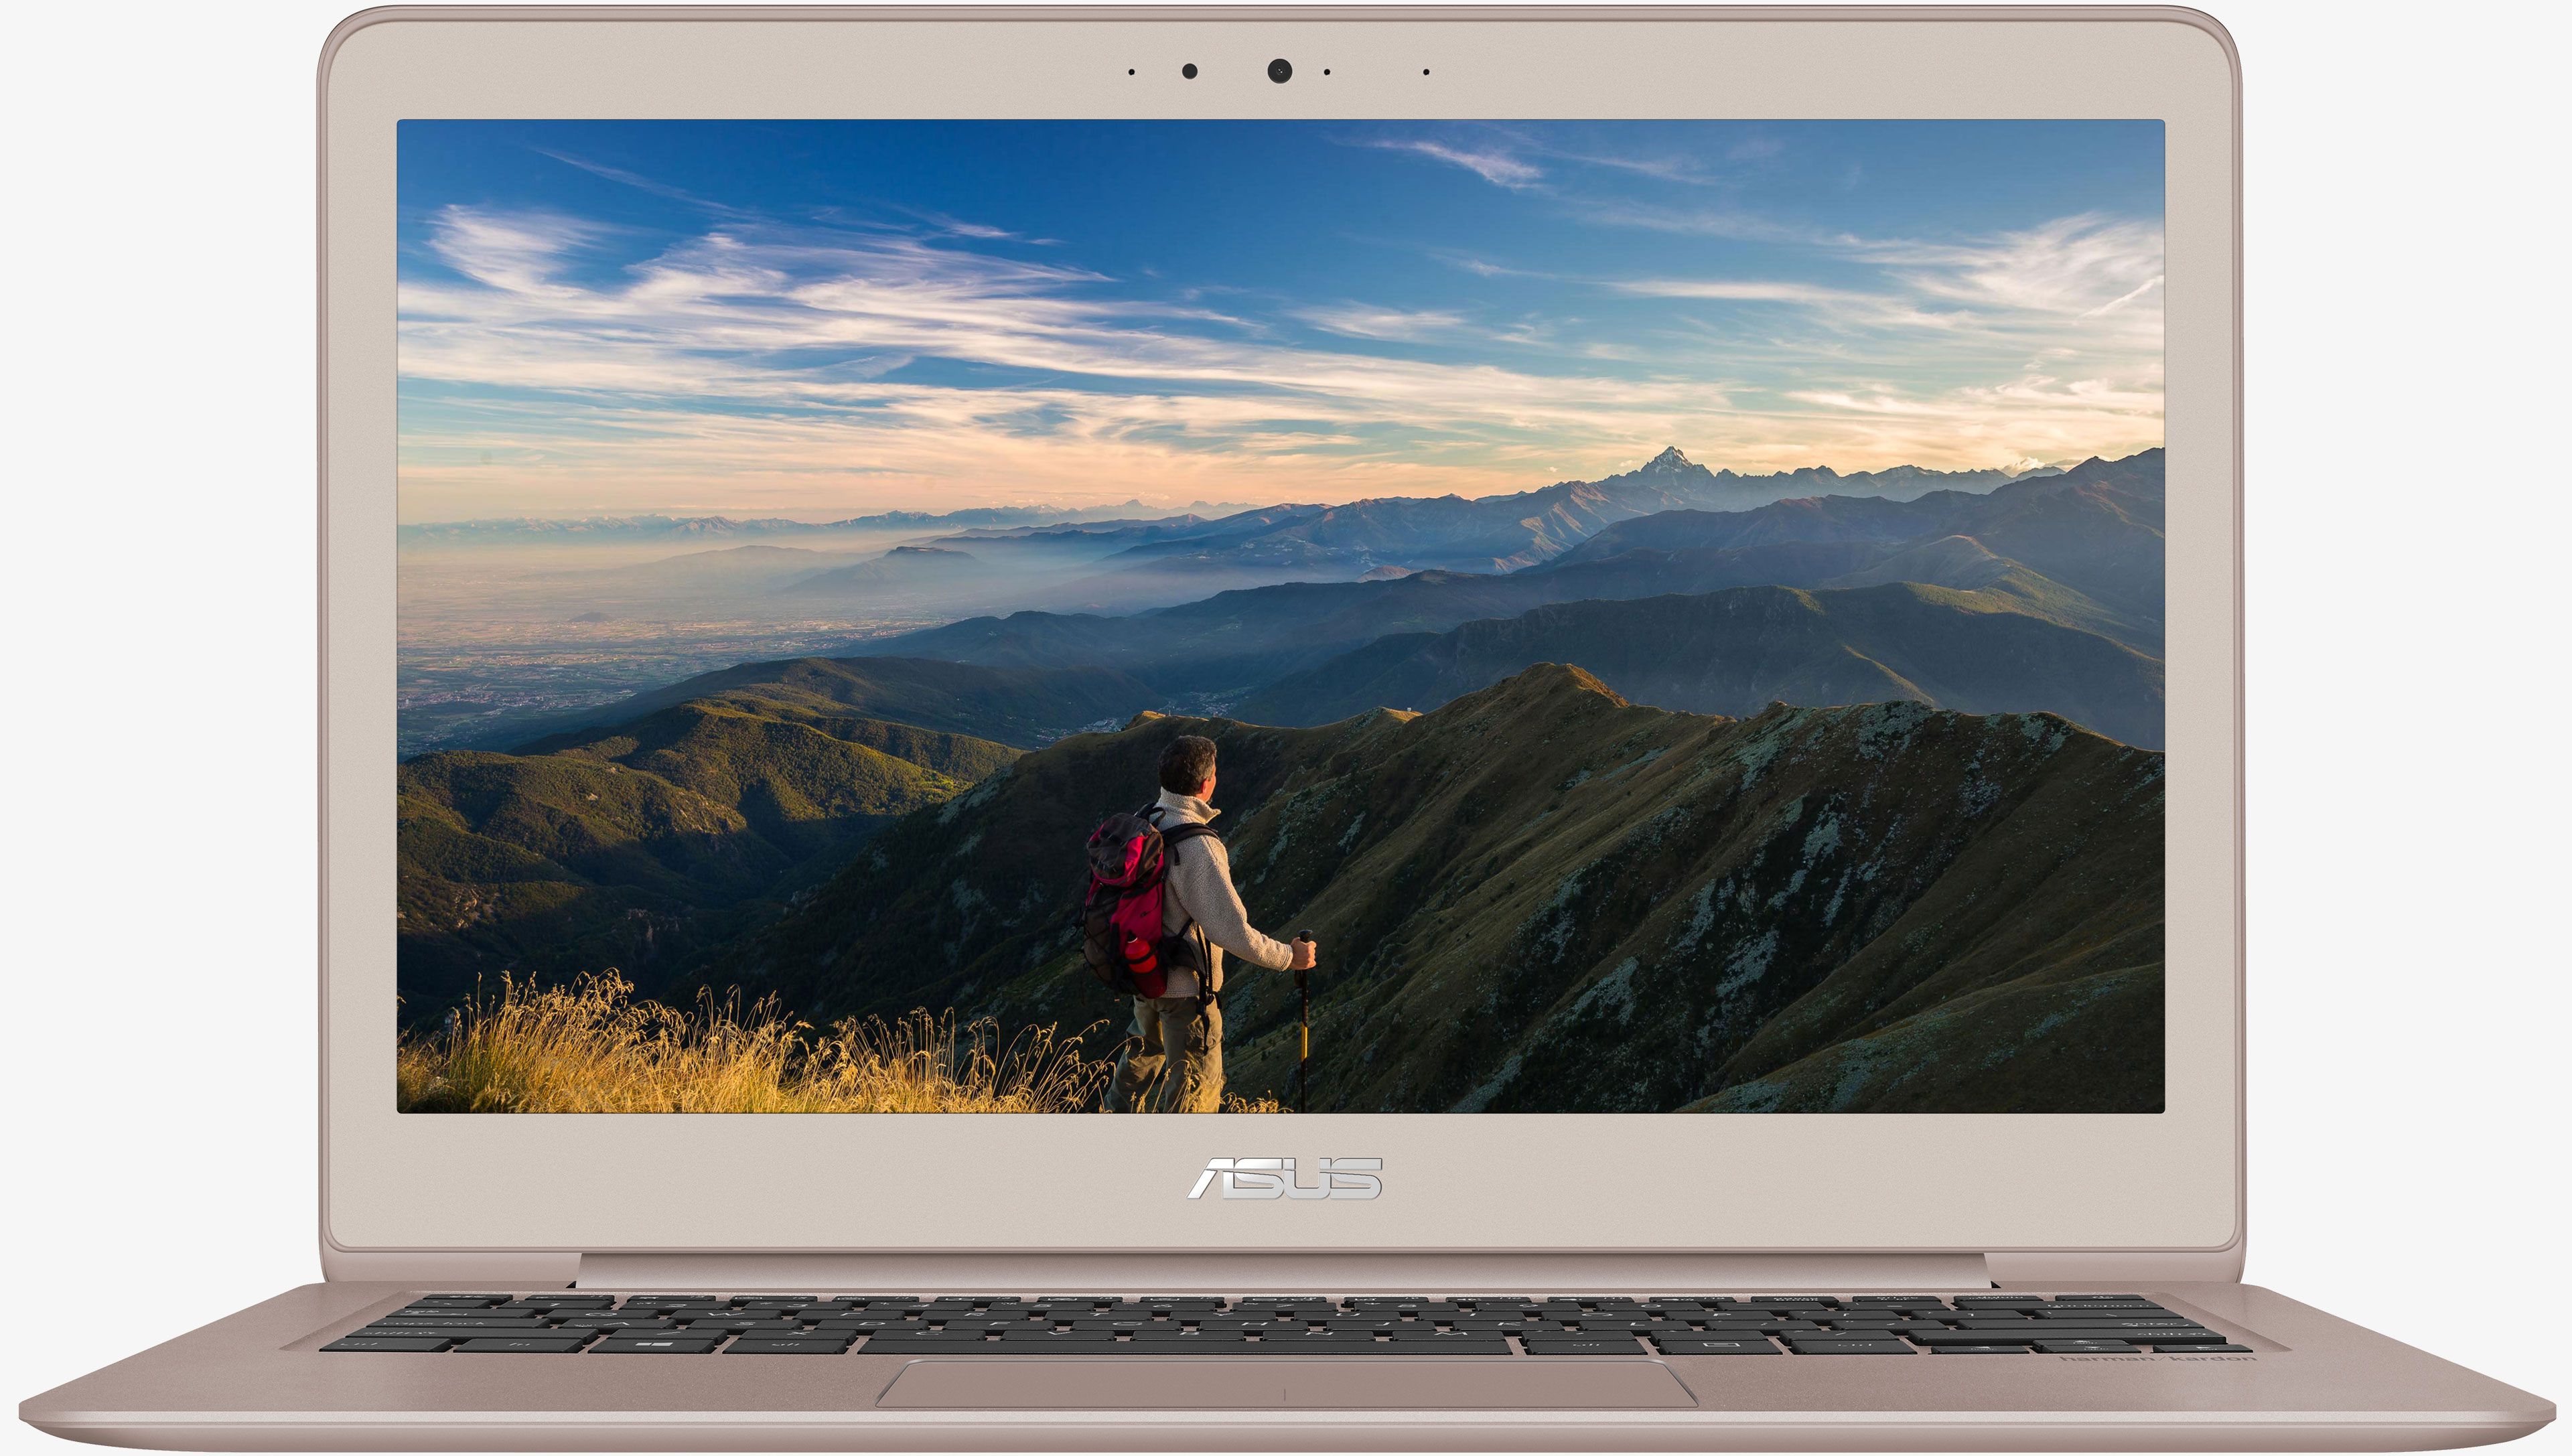 Asus Zenbook Ux330ua Laptops Usa However The Public Zba Bt22k2042 Datasheet Has A Complete Schematic